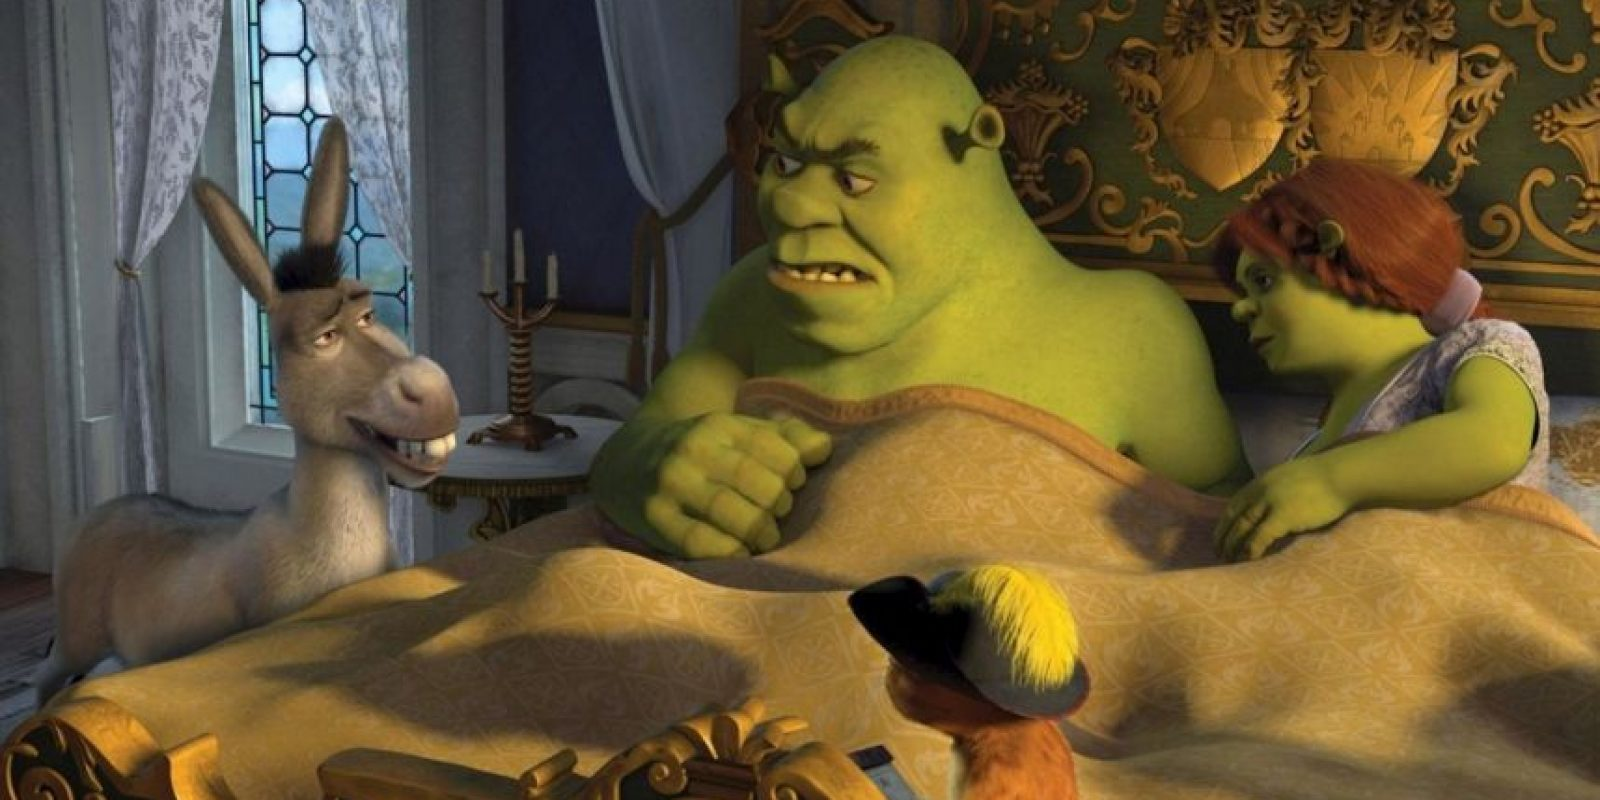 Foto:DreamWorks Animation. Imagen Por: